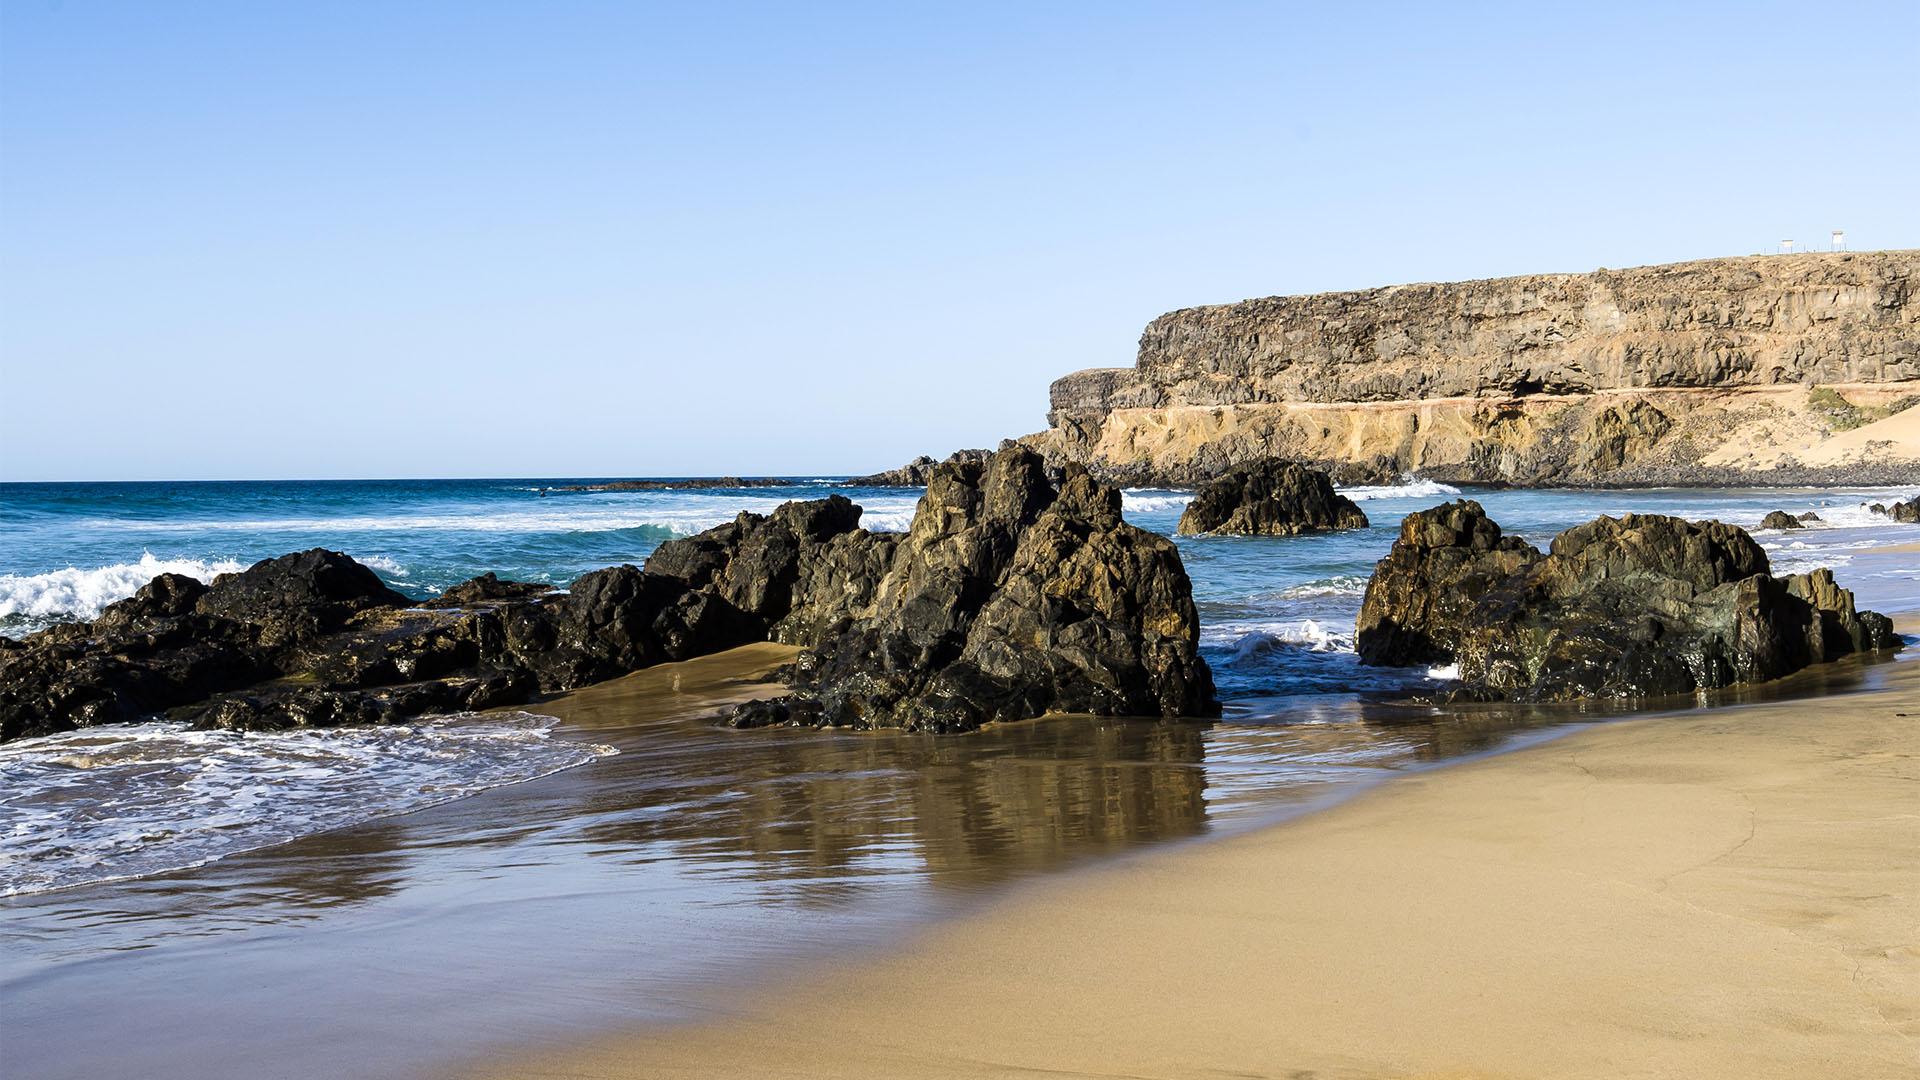 Die Strände Fuerteventuras: Playa de Esquinzo